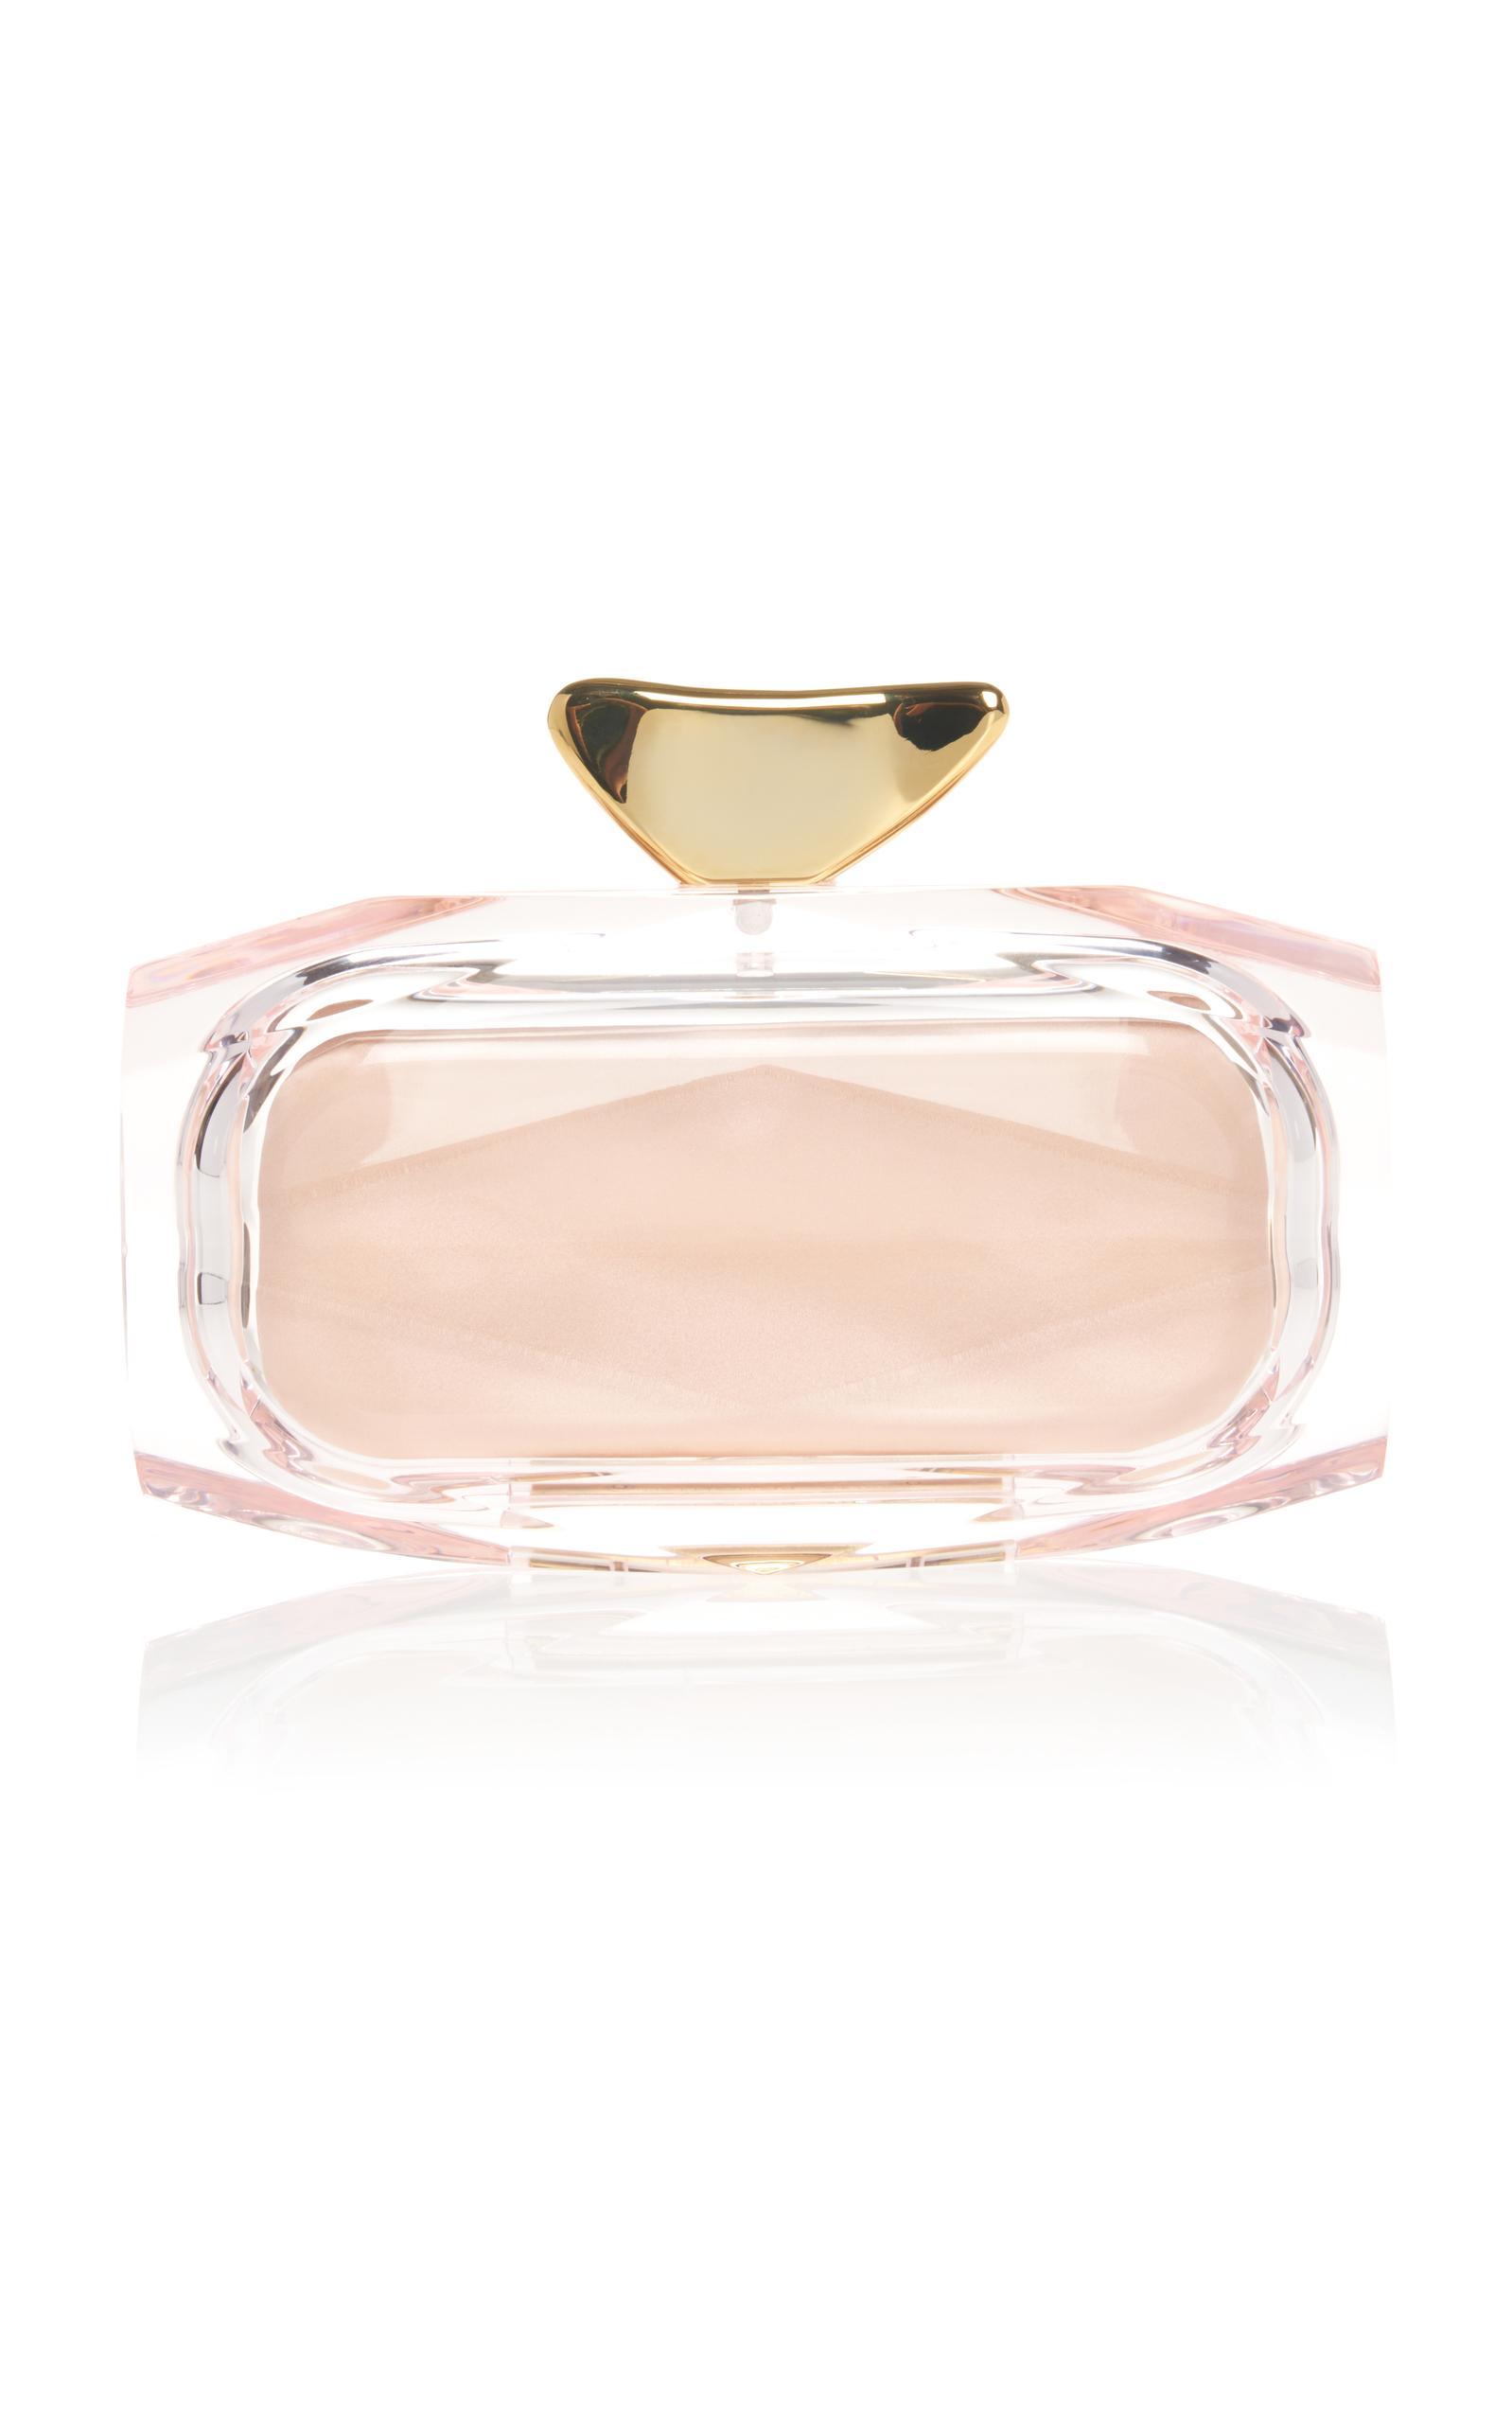 Benedetta Bruzziches Plexiglass Clutch With Brass Breeze In Pink